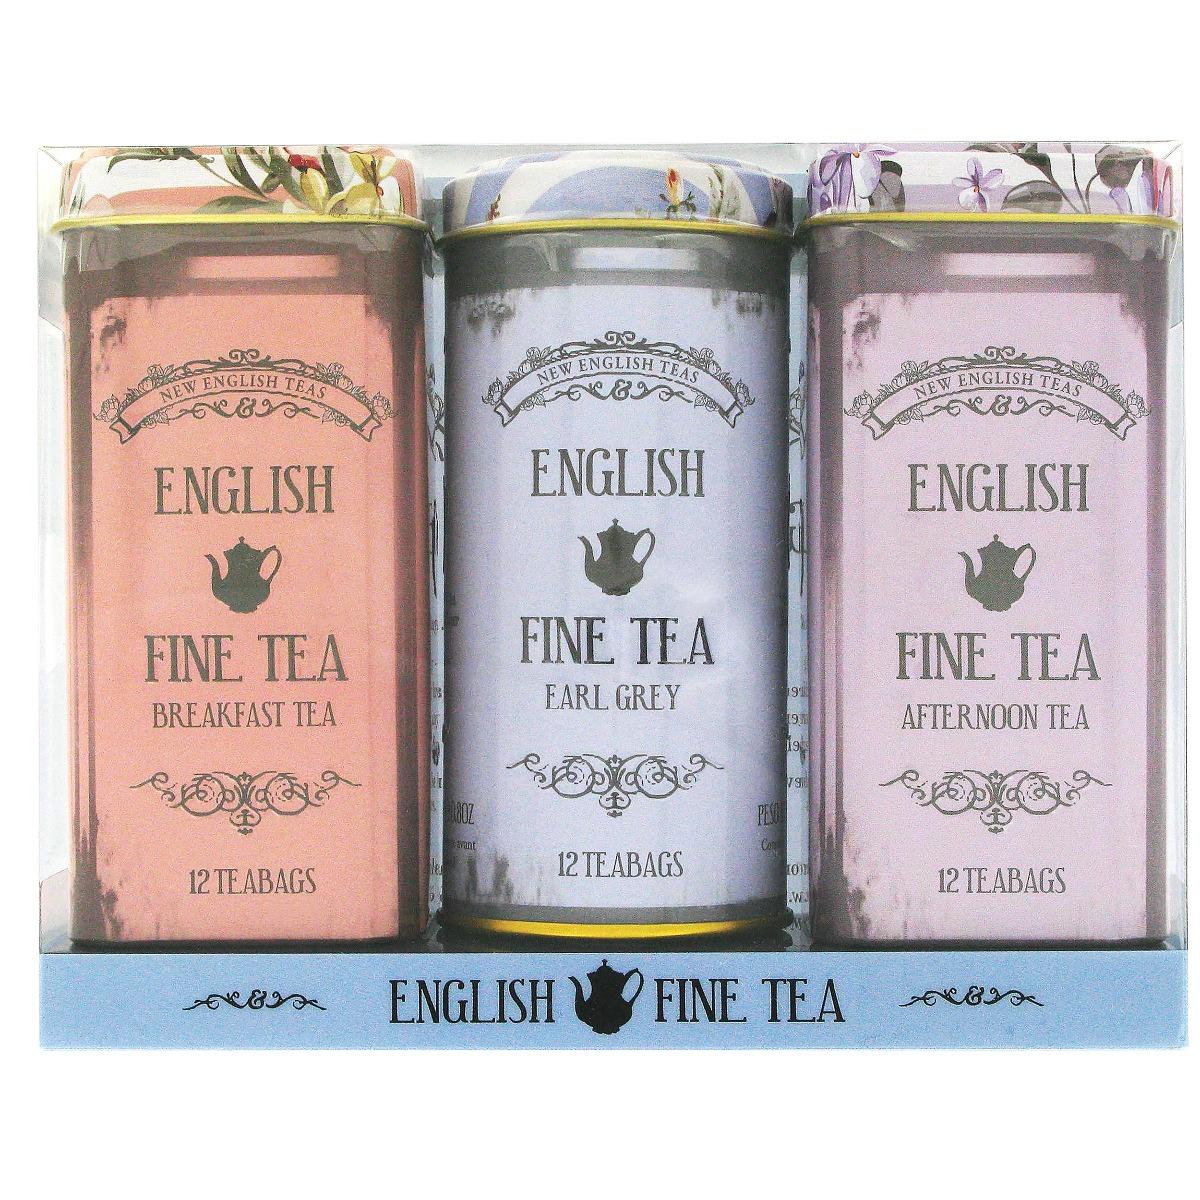 Vintage floral English fine tea set